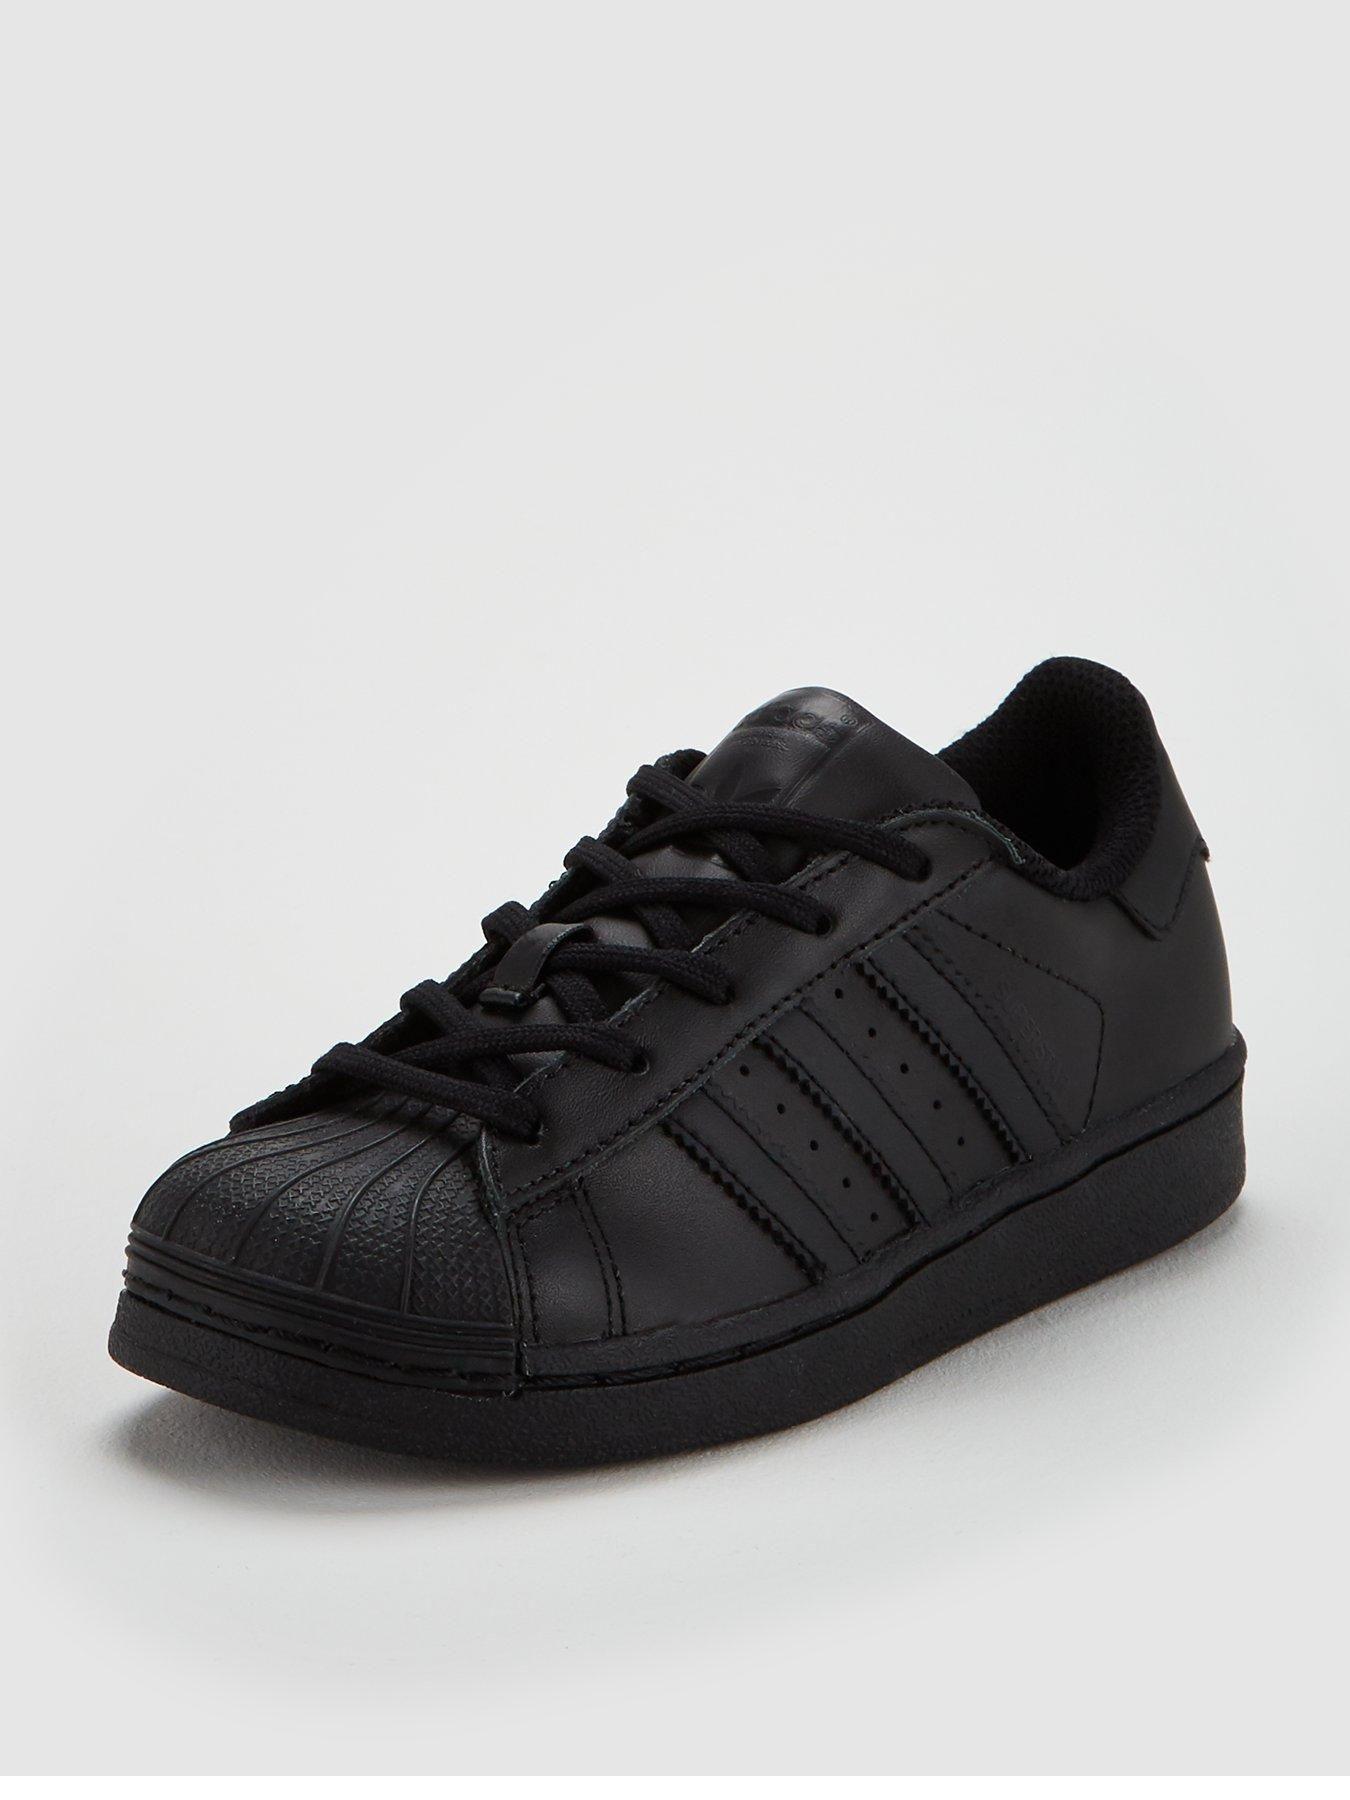 childrens adidas black trainers